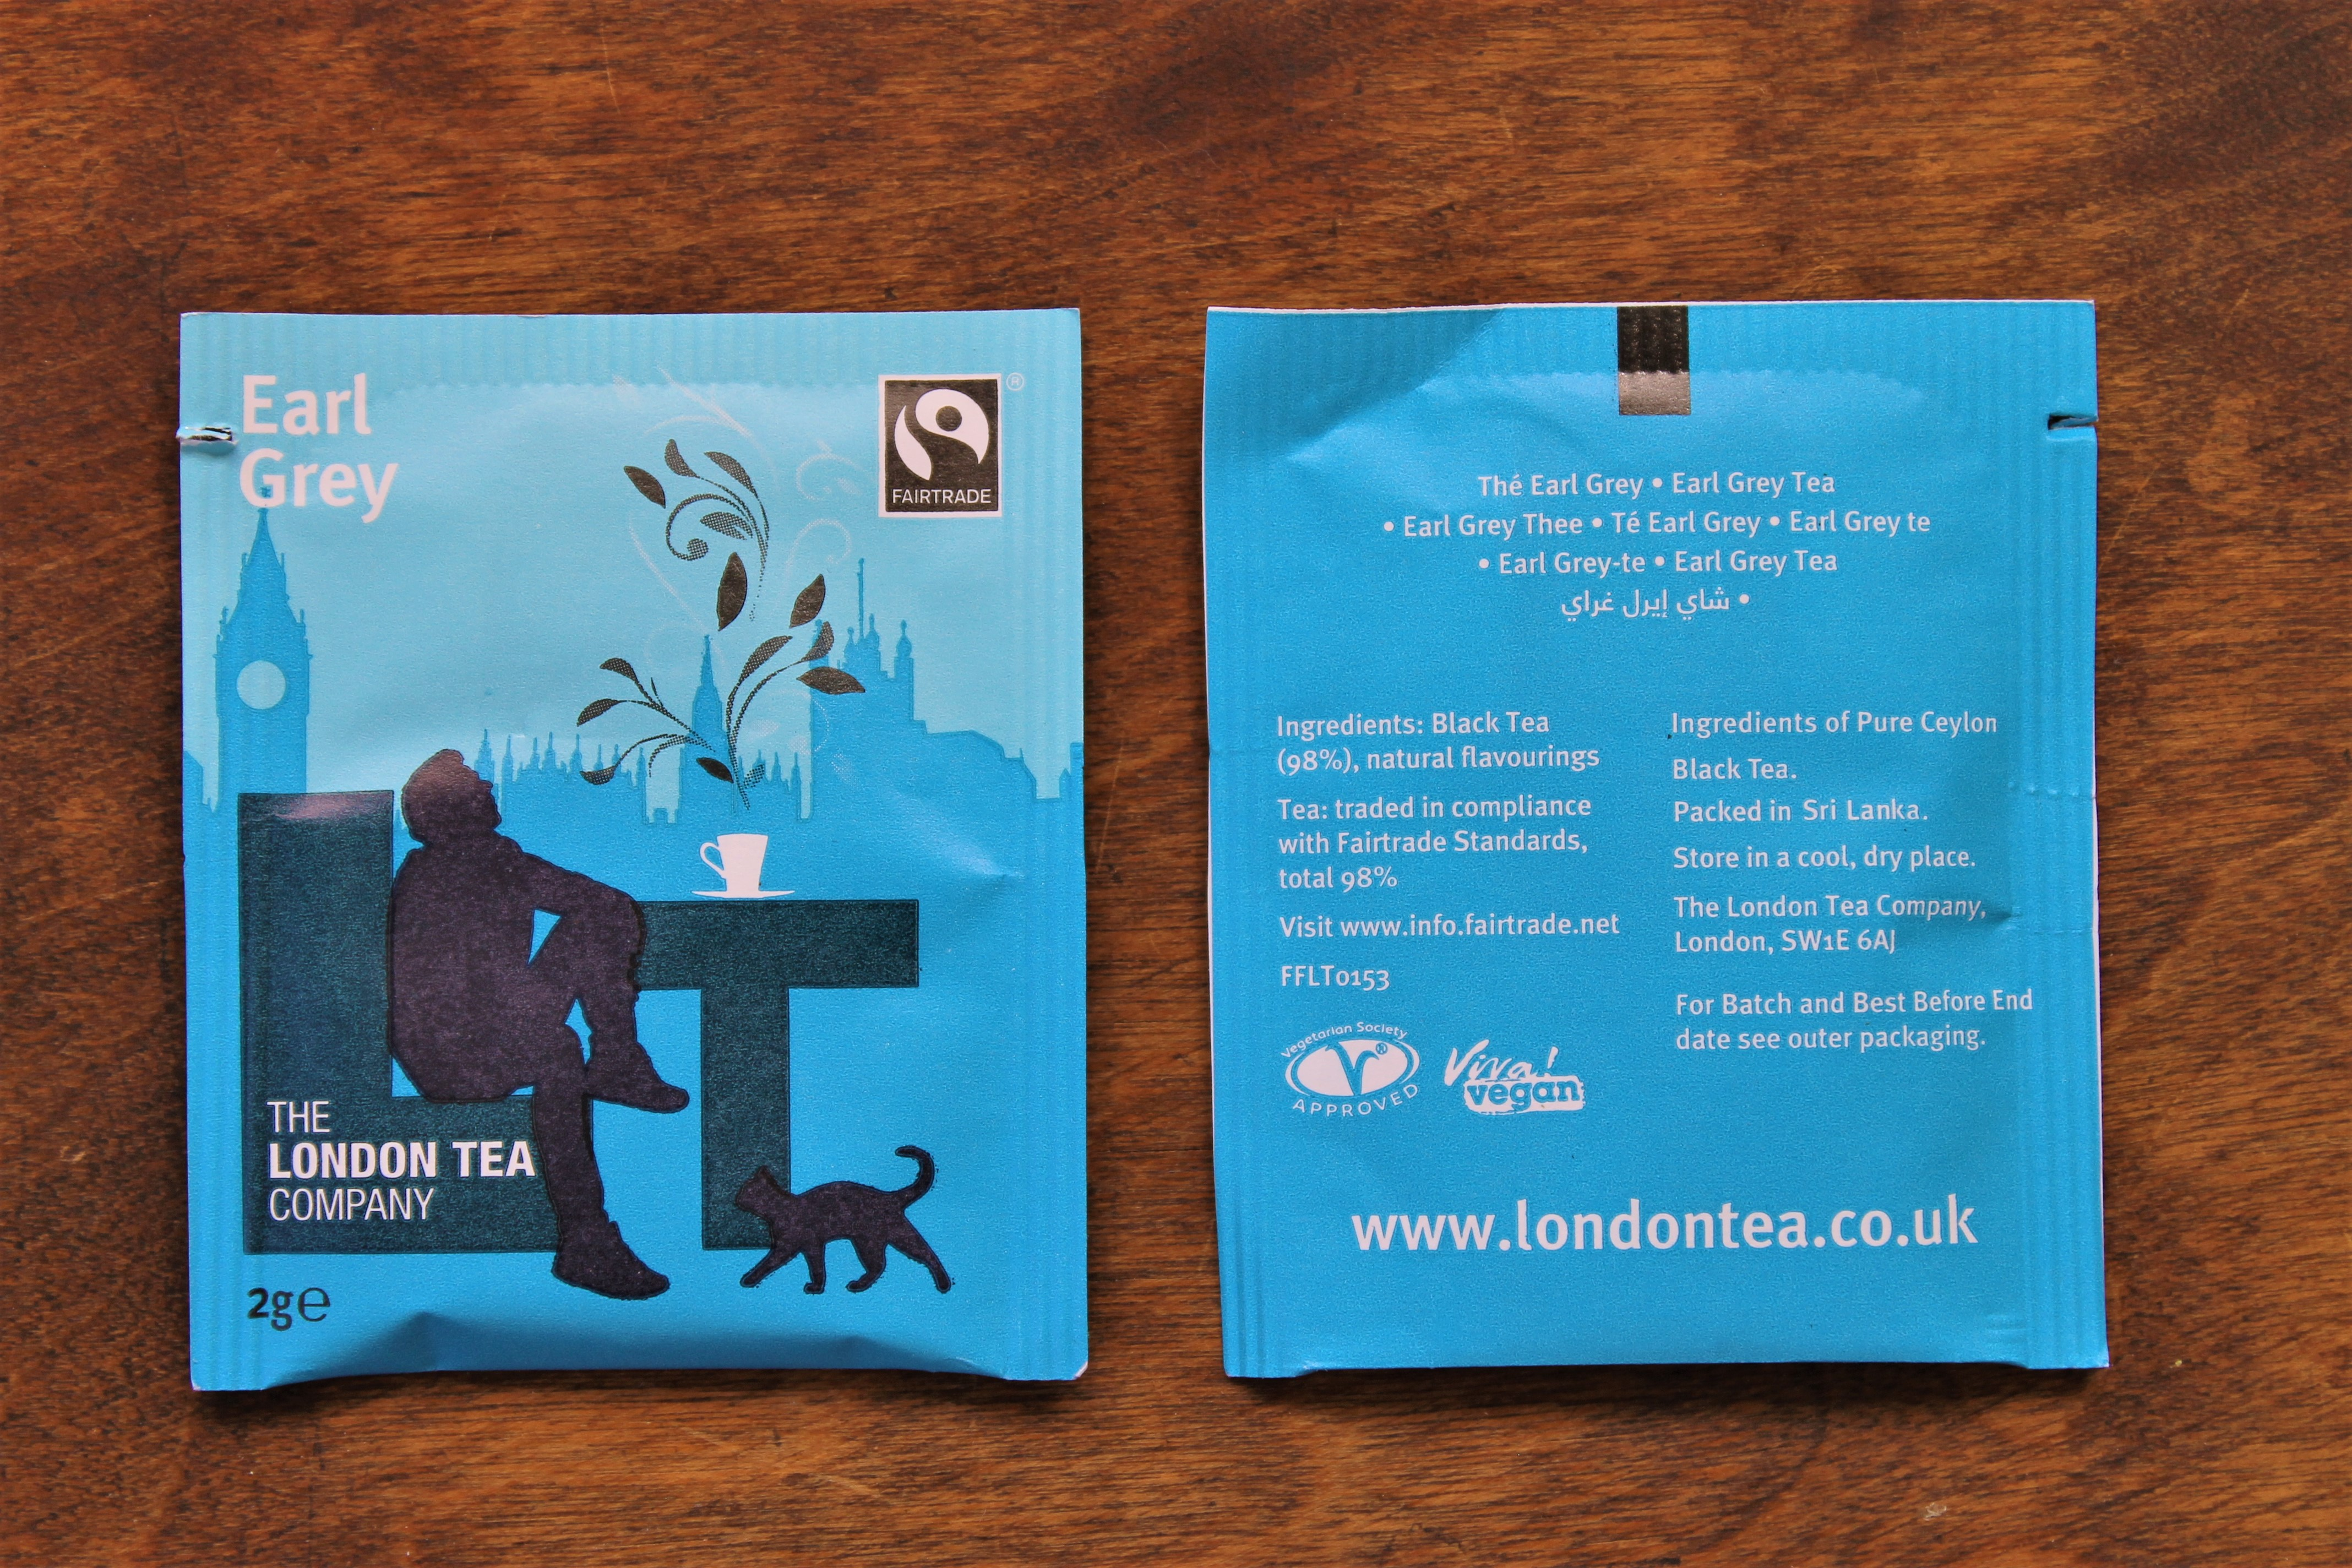 london tea company earl grey teabags